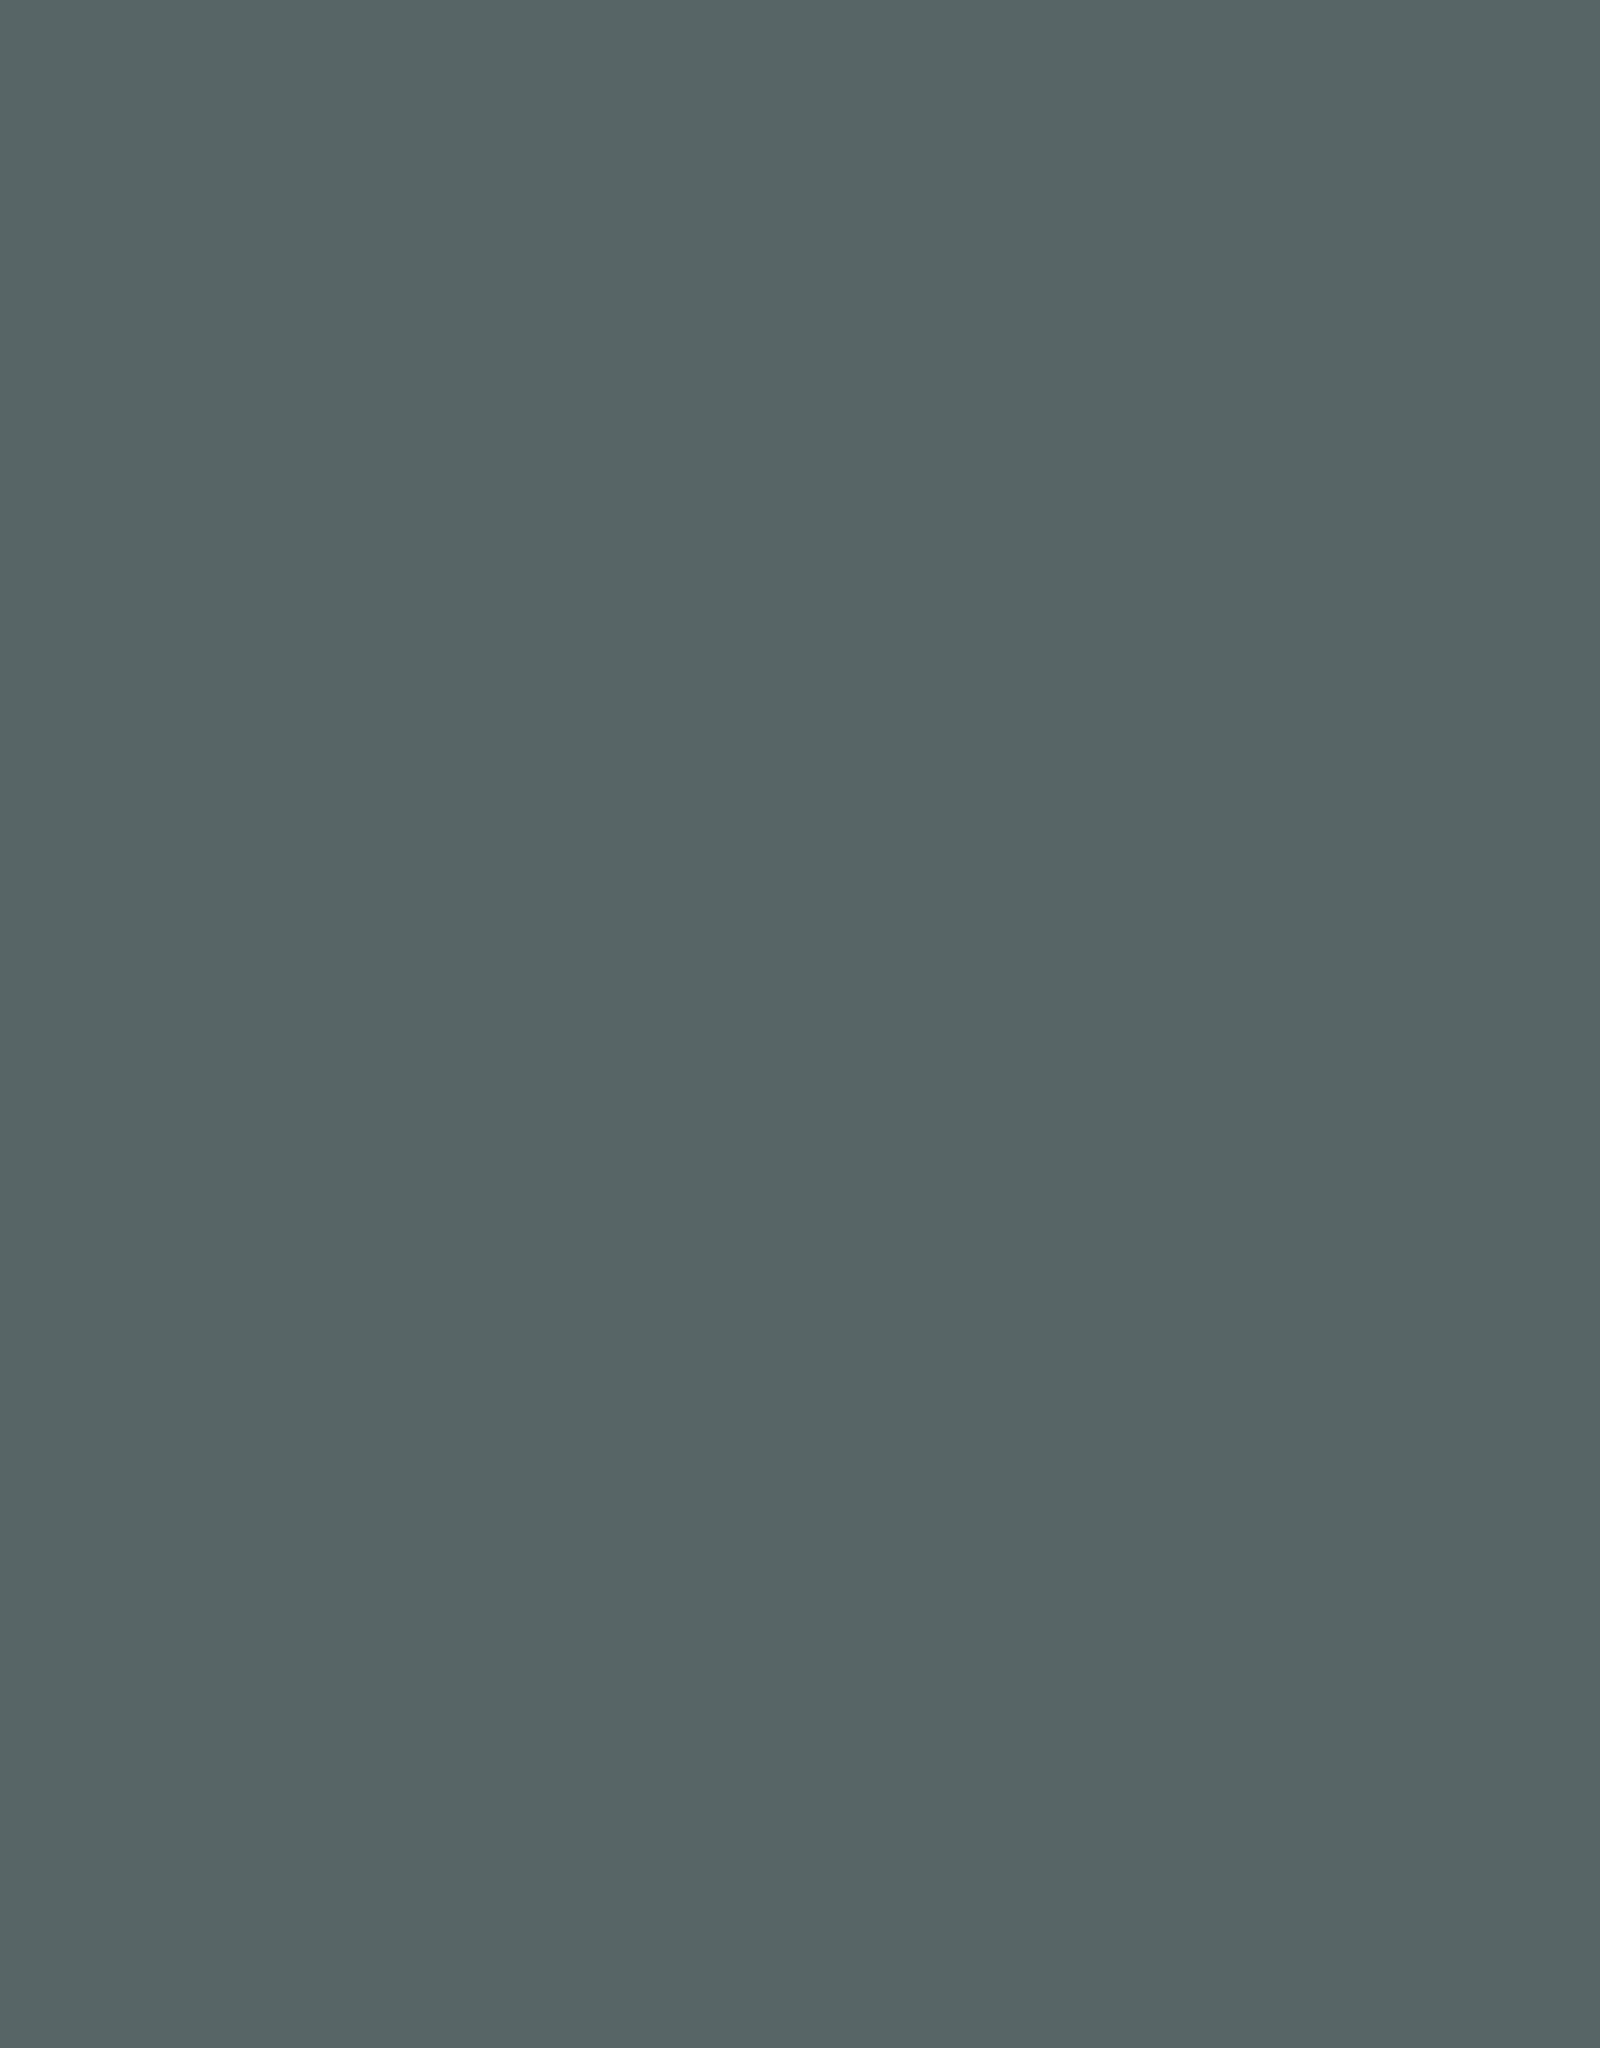 Sennelier, Extra Fine Soft Pastel, Gray